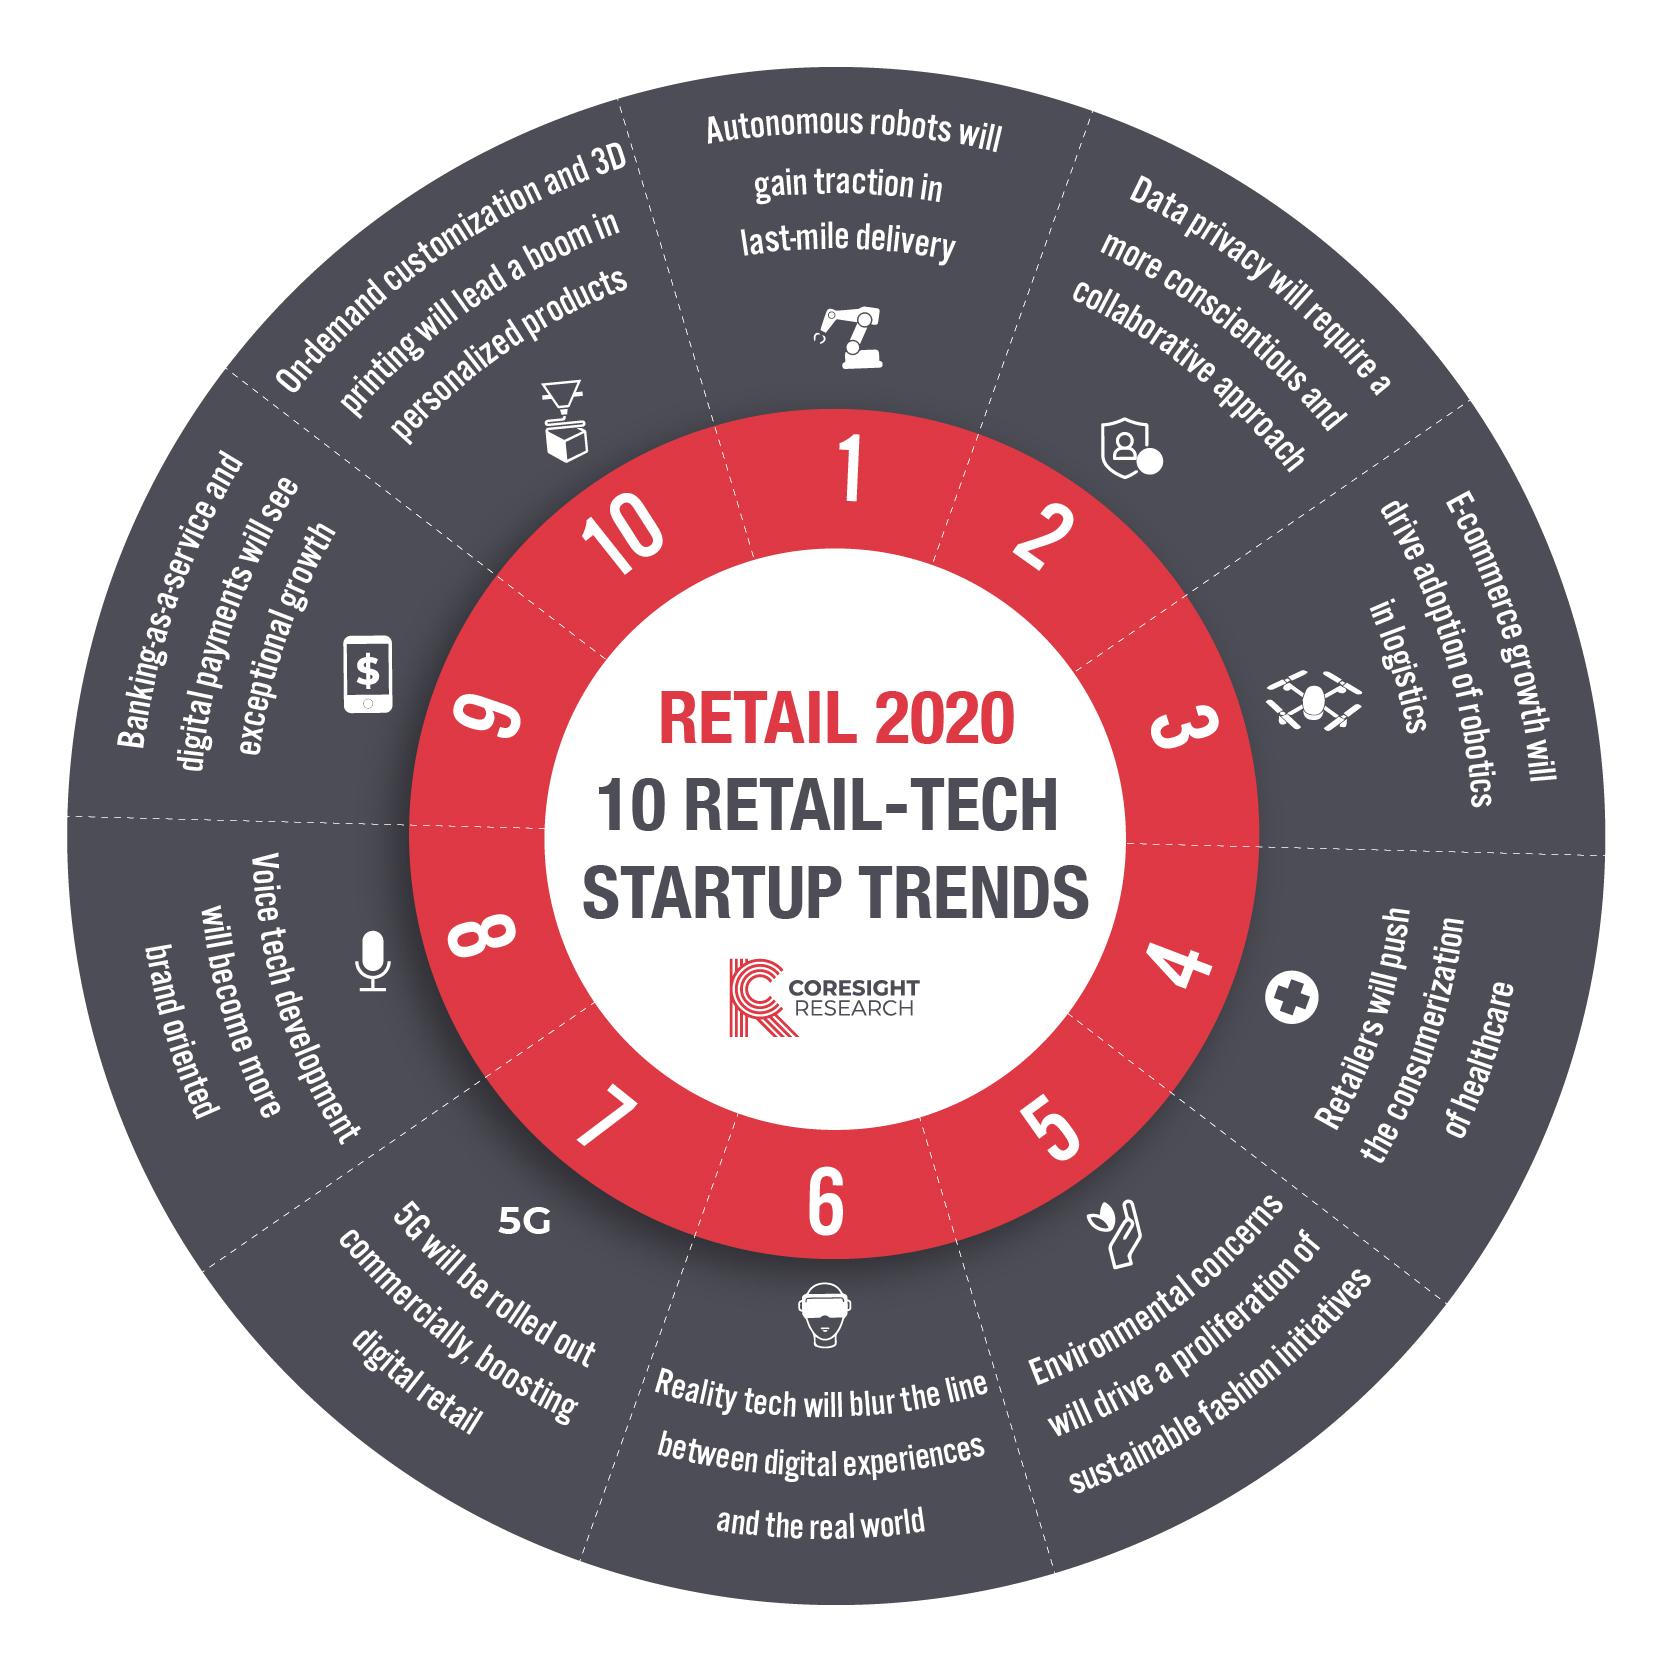 Retail 2020: 10 Retail-Tech Startup Trends